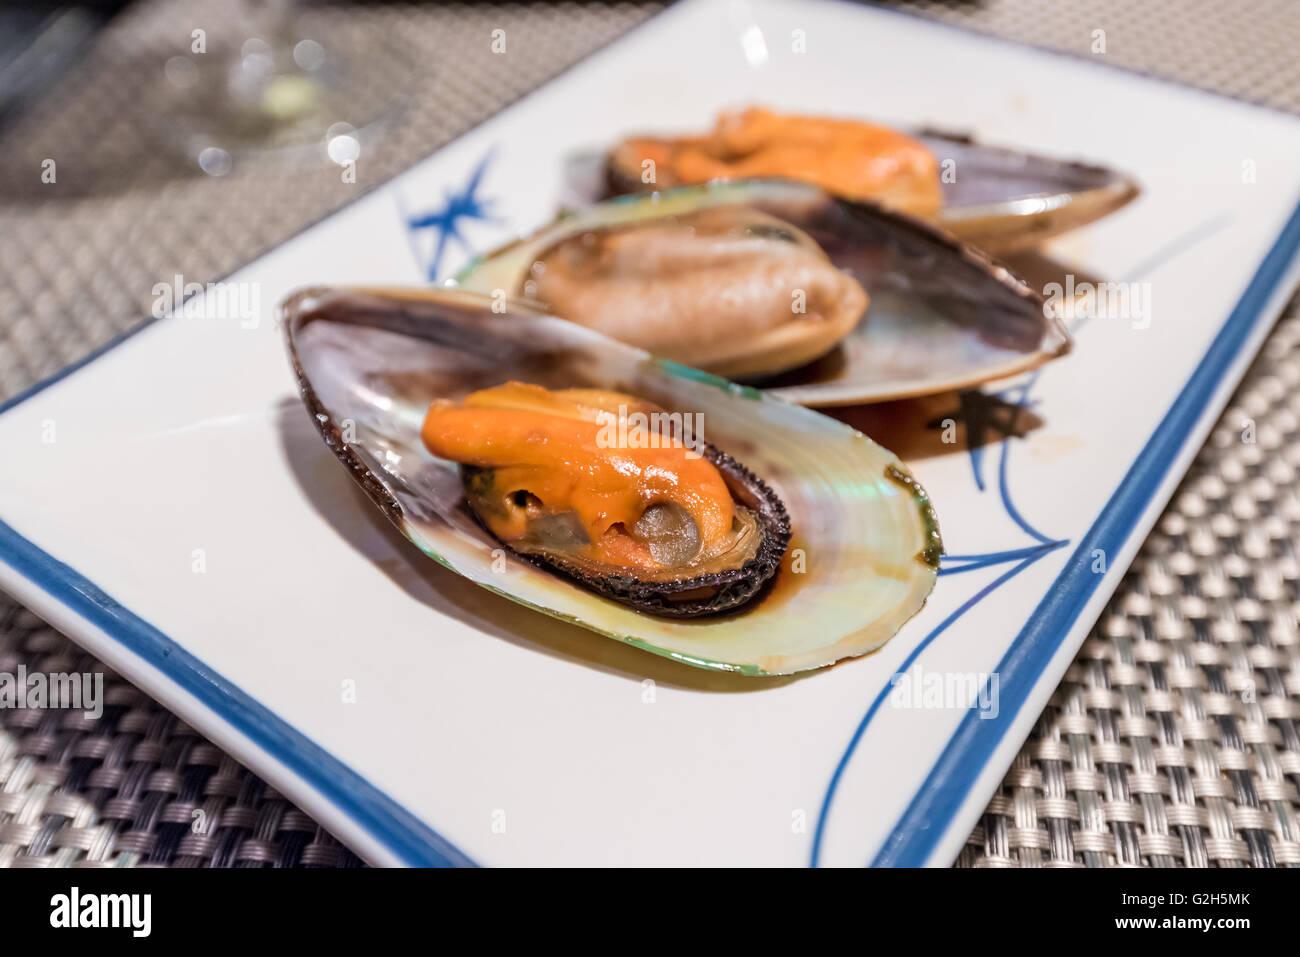 Newzealand mussel teppanyaki on white dish - Stock Image